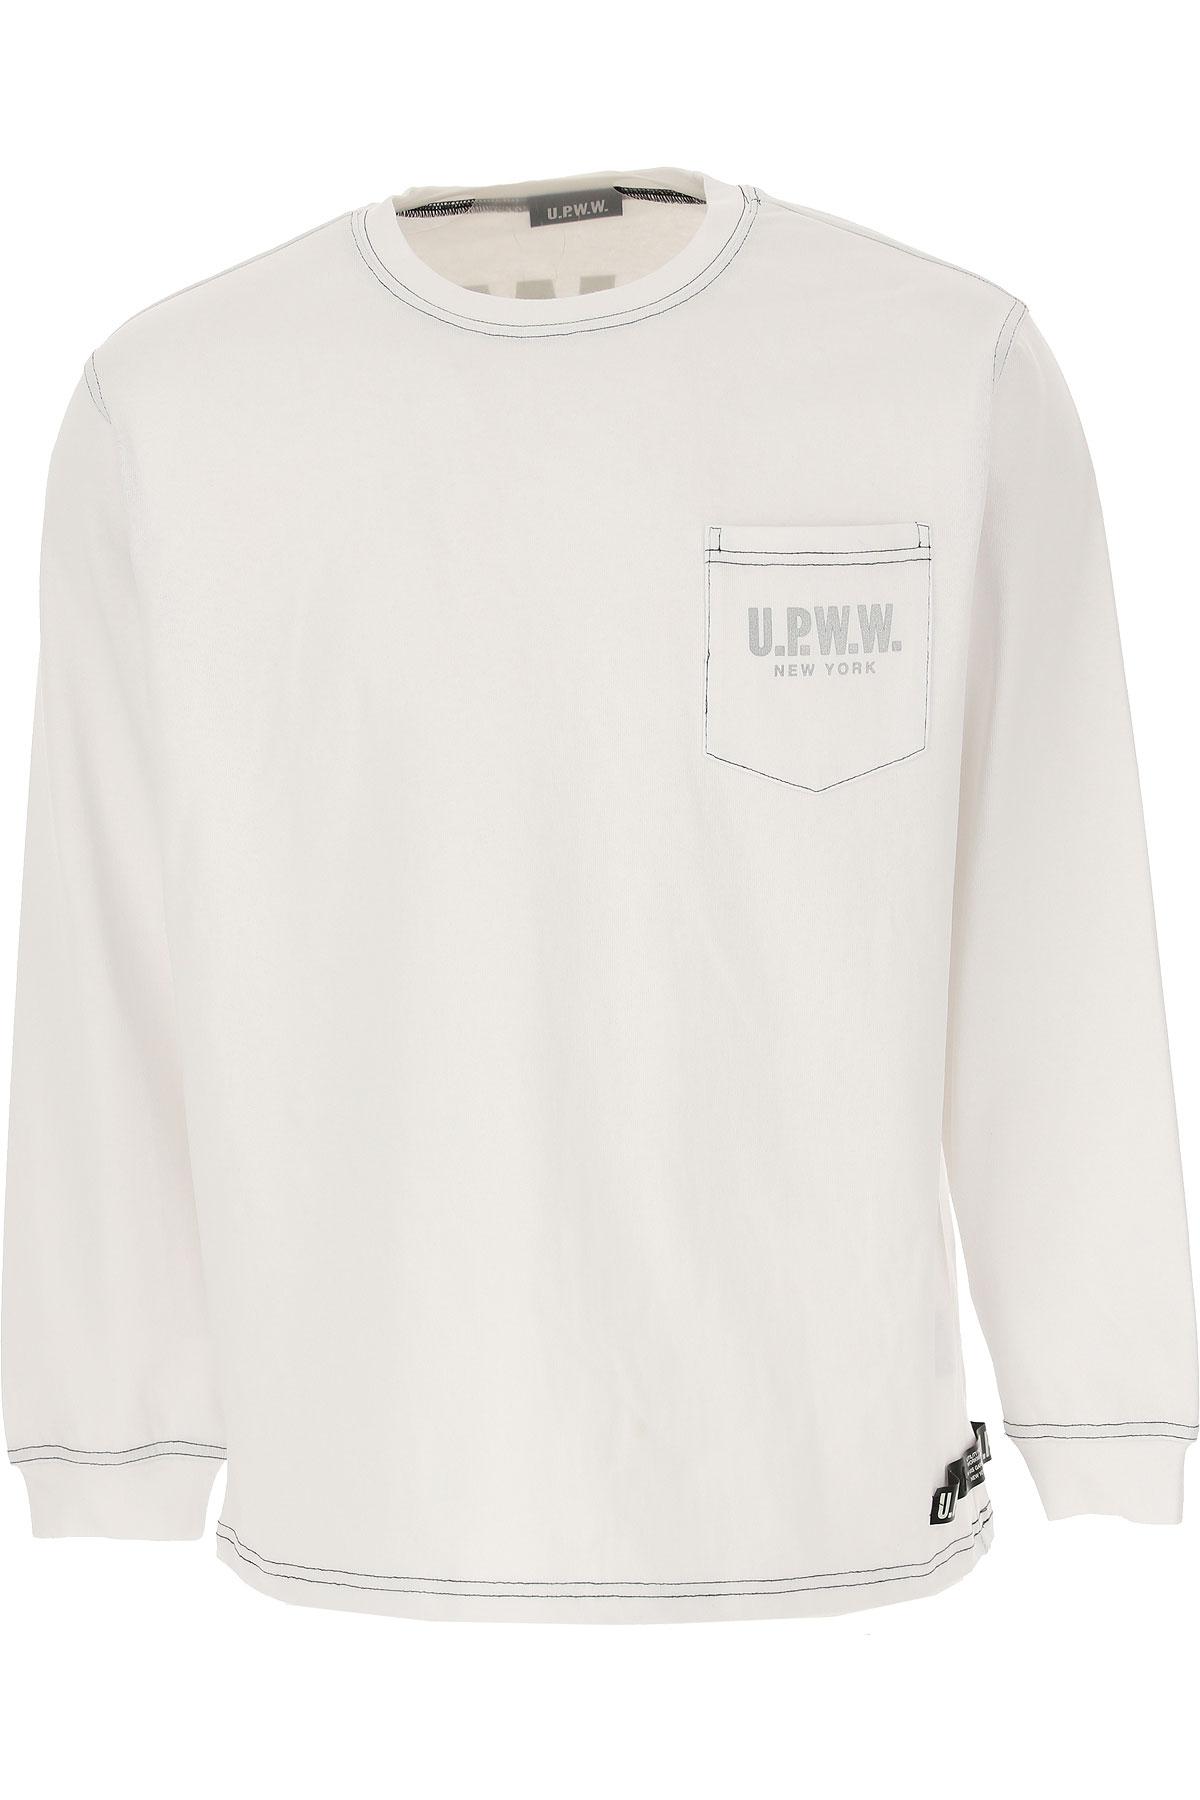 U.P.W.W. T-Shirt for Men, White, Cotton, 2019, M S